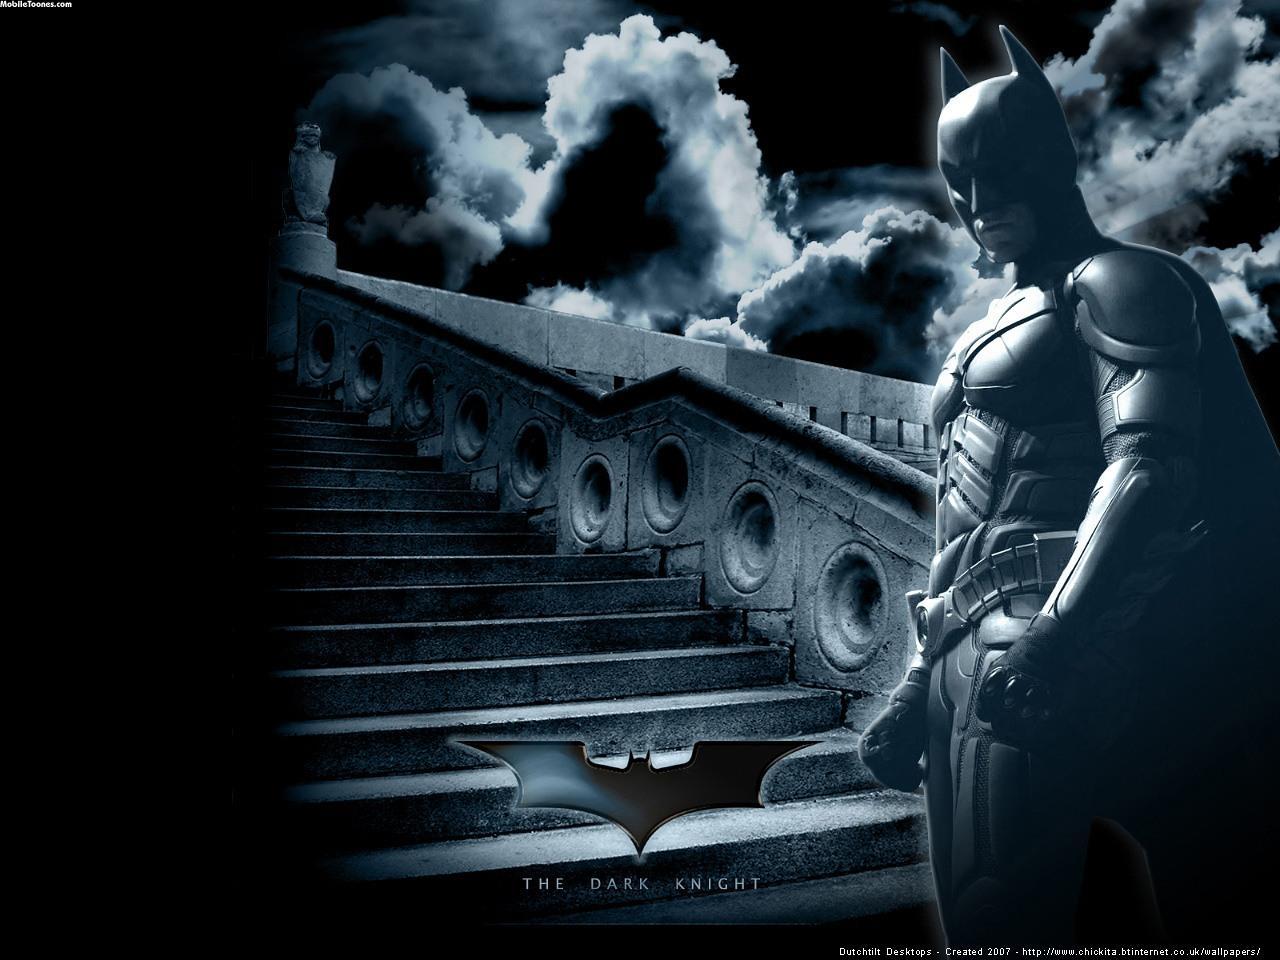 The Dark Knight Mobile Wallpaper